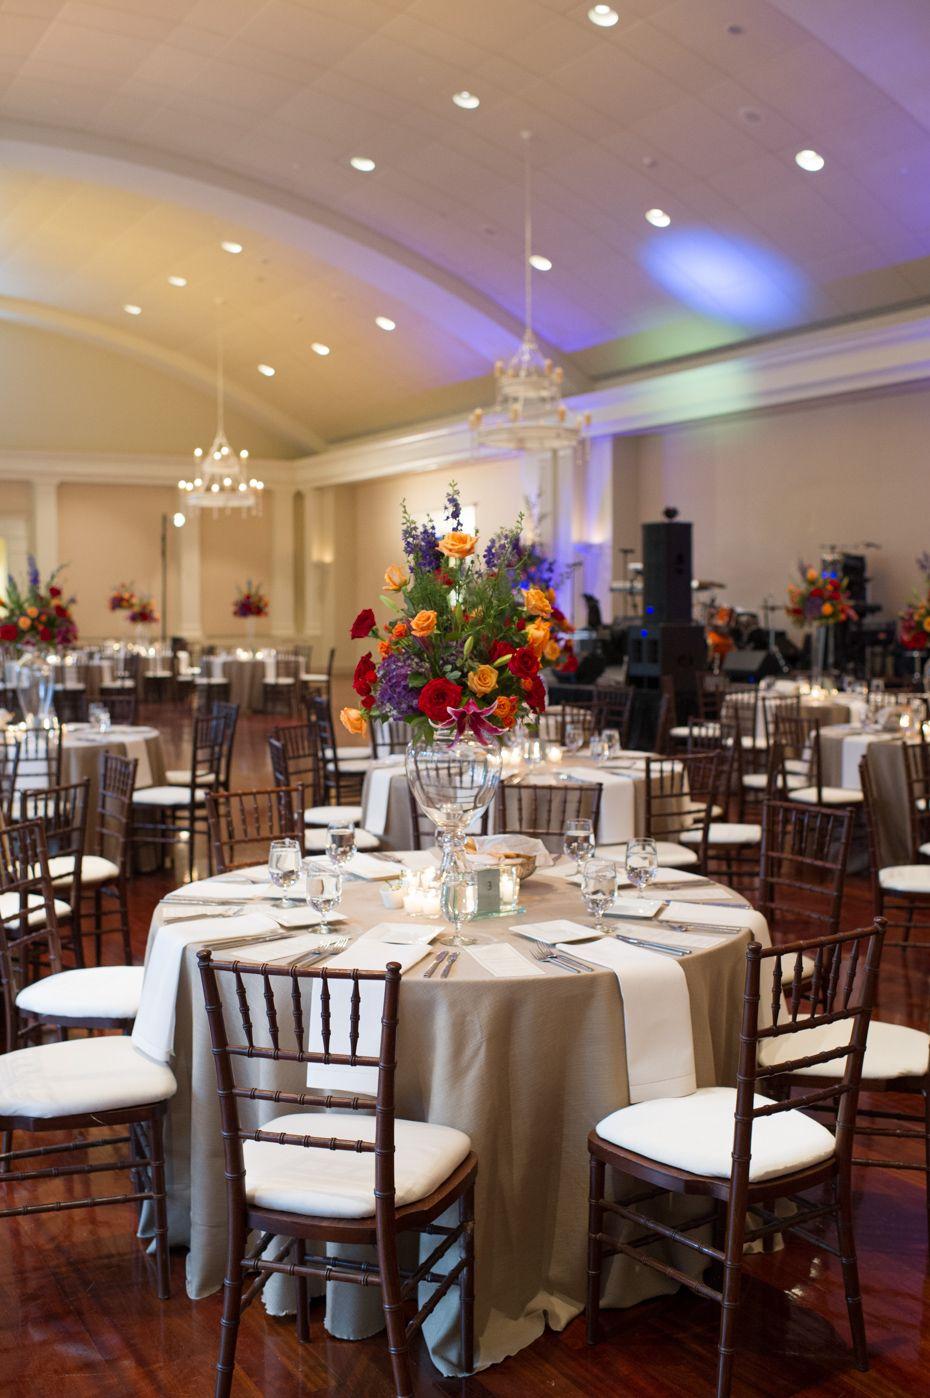 wedding venues on budget in atlanta%0A Grand Overlook Ballroom Atlanta History Center Photos